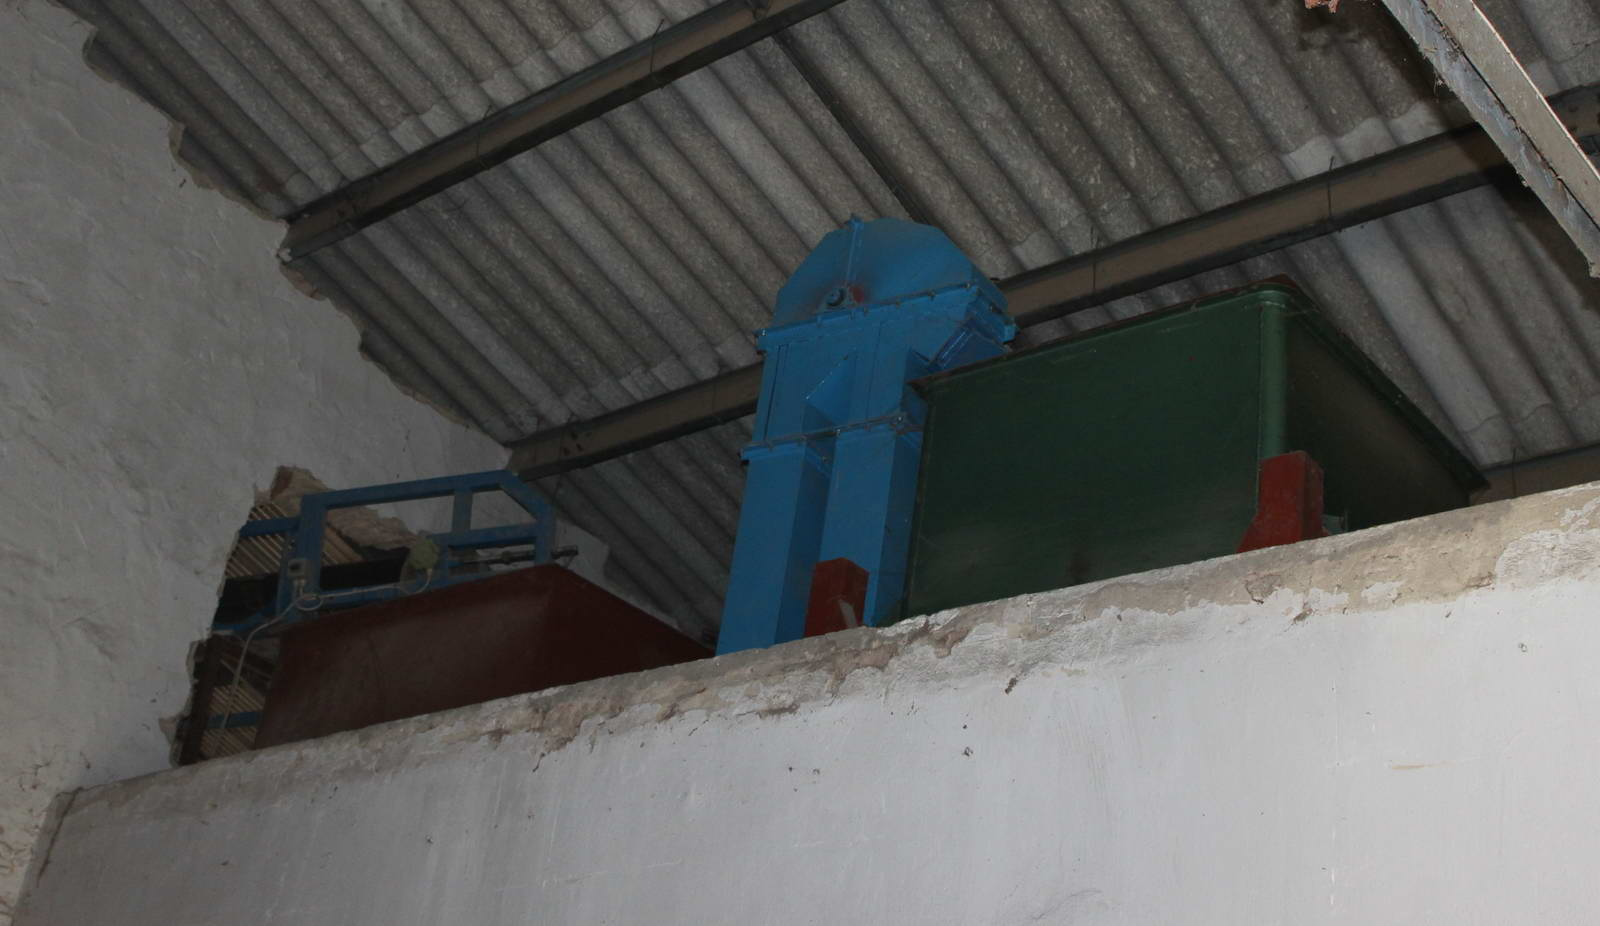 Seed dressing equipment